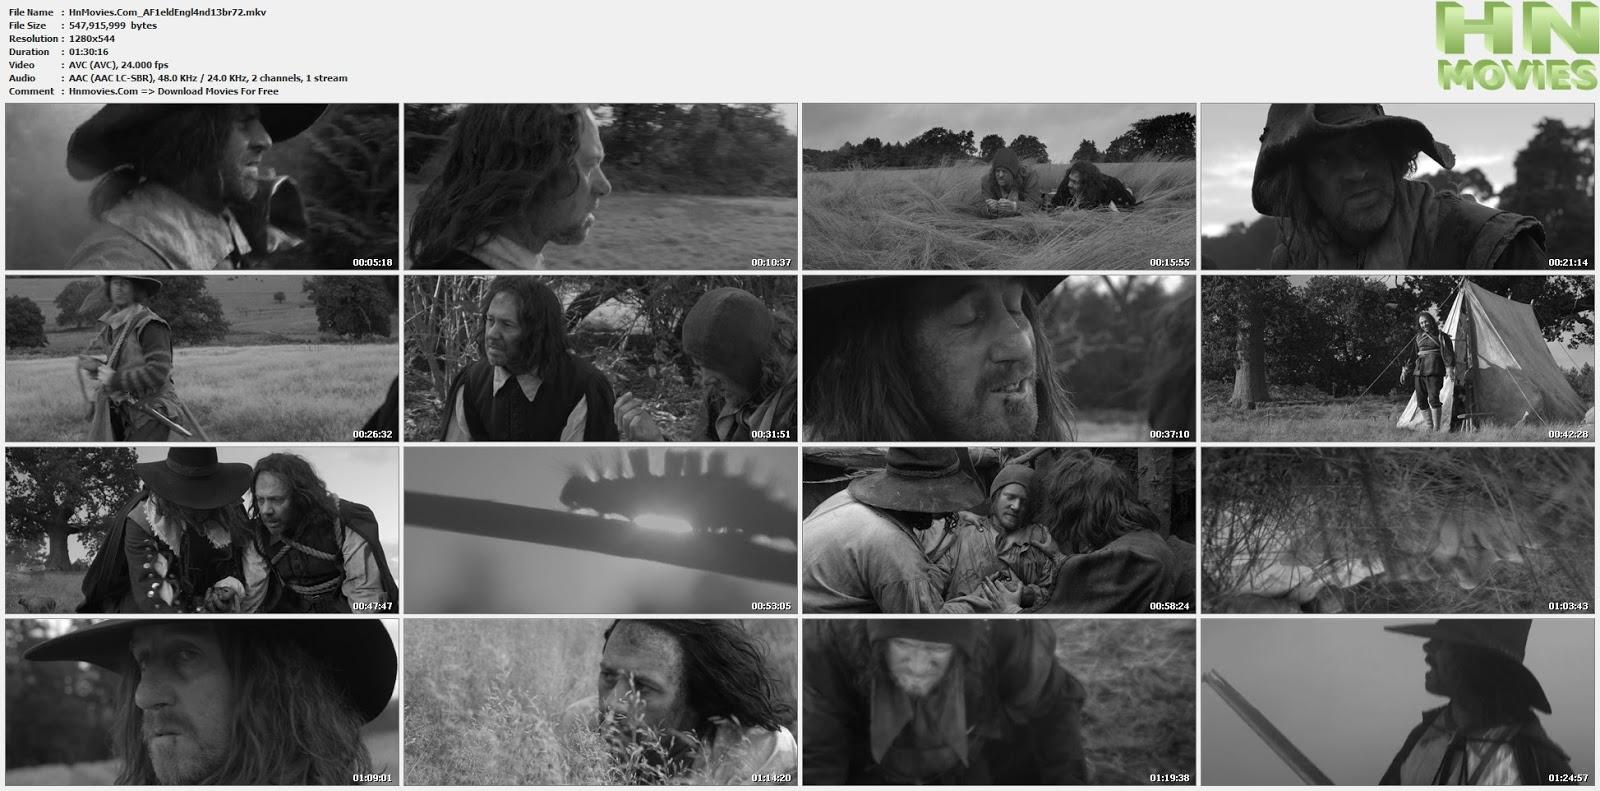 movie screenshot of A Field in England fdmovie.com